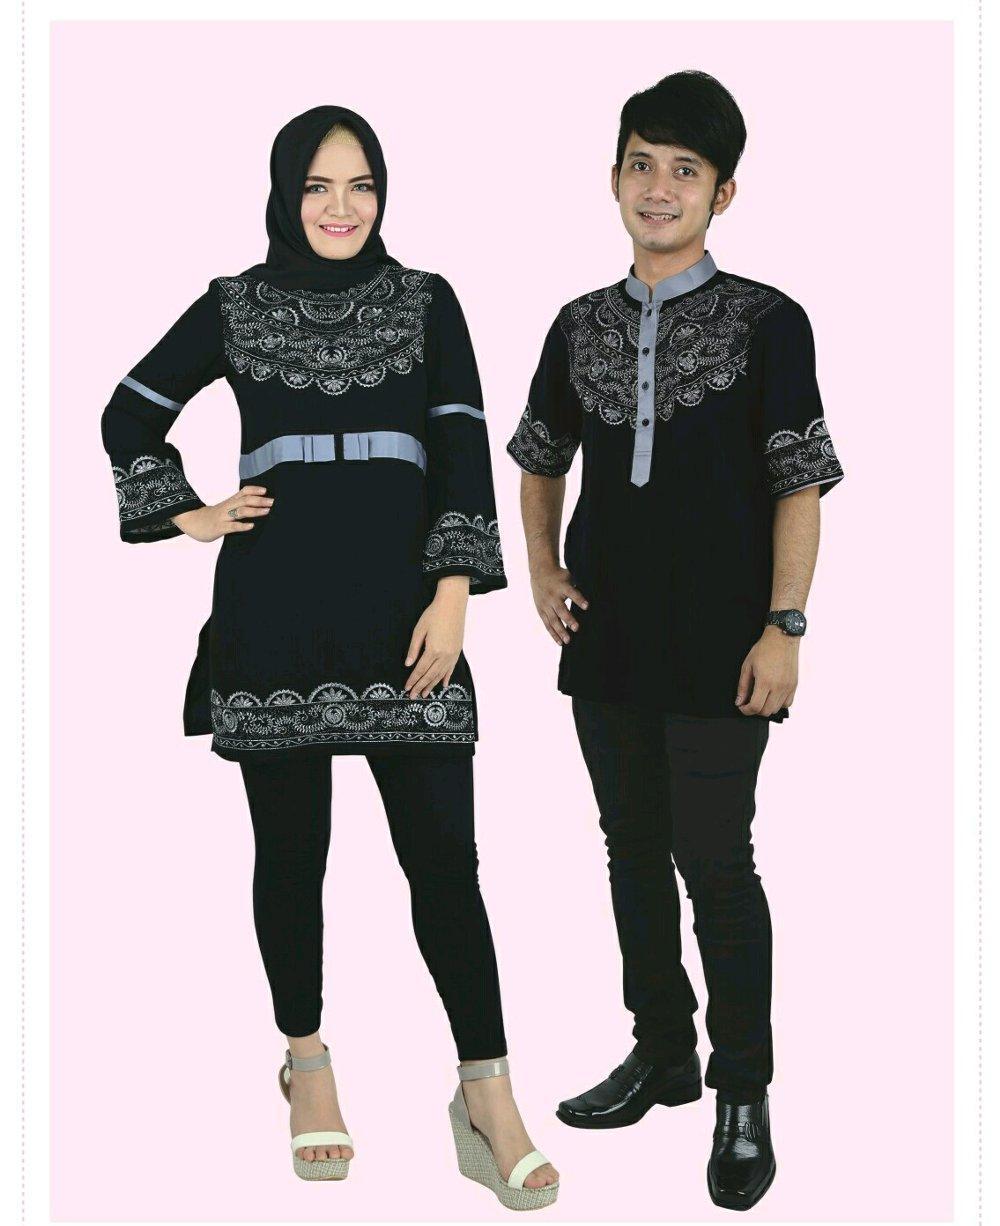 Baju Muslim COUPLE Raindoz 2181 2182 di lapak DISTRO GROSIR MURAH BANDUNG sepatumurahnian